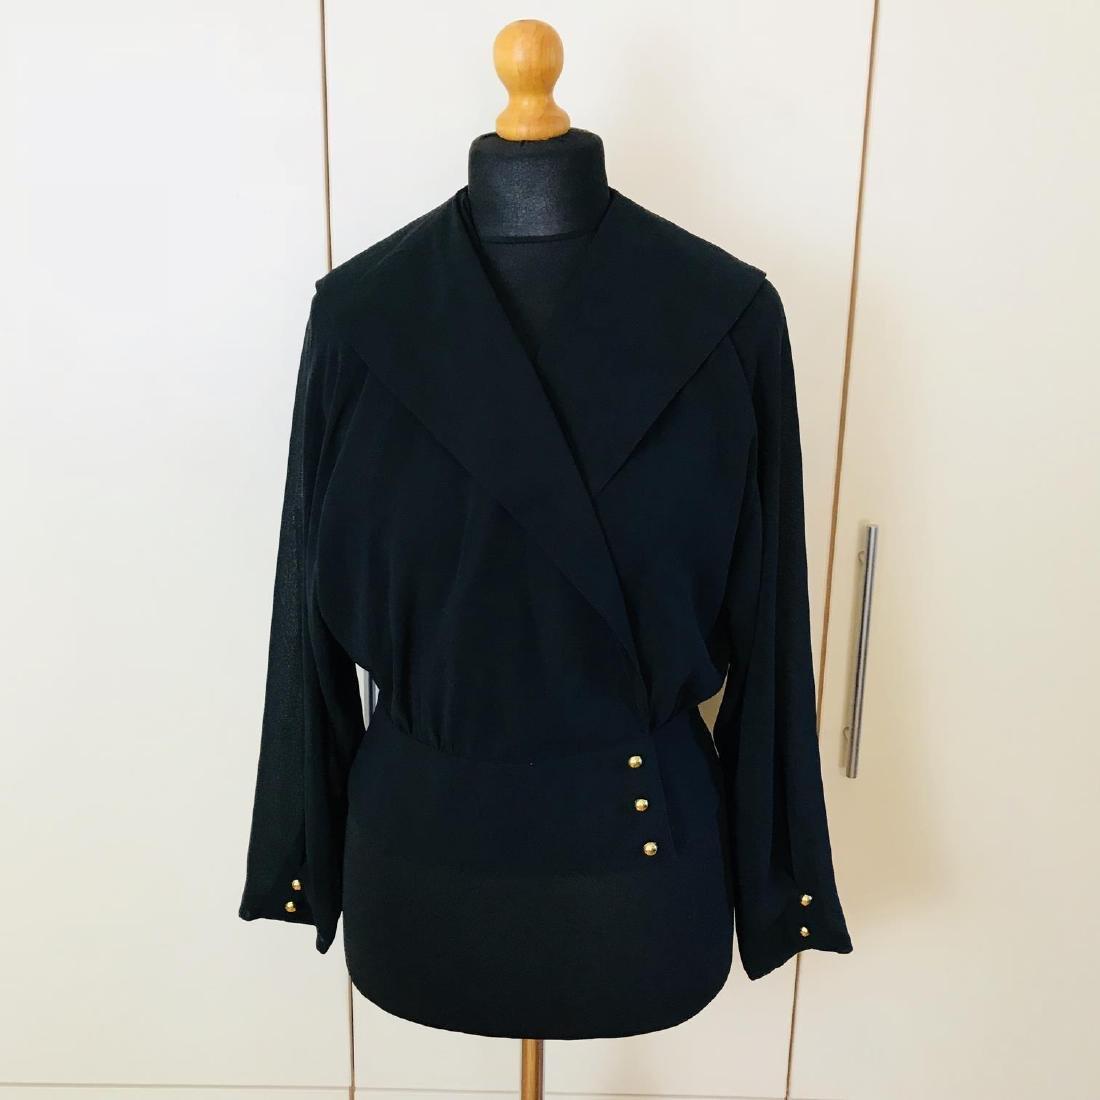 Vintage Women's Denise Darcy Designer Blouse Shirt Top